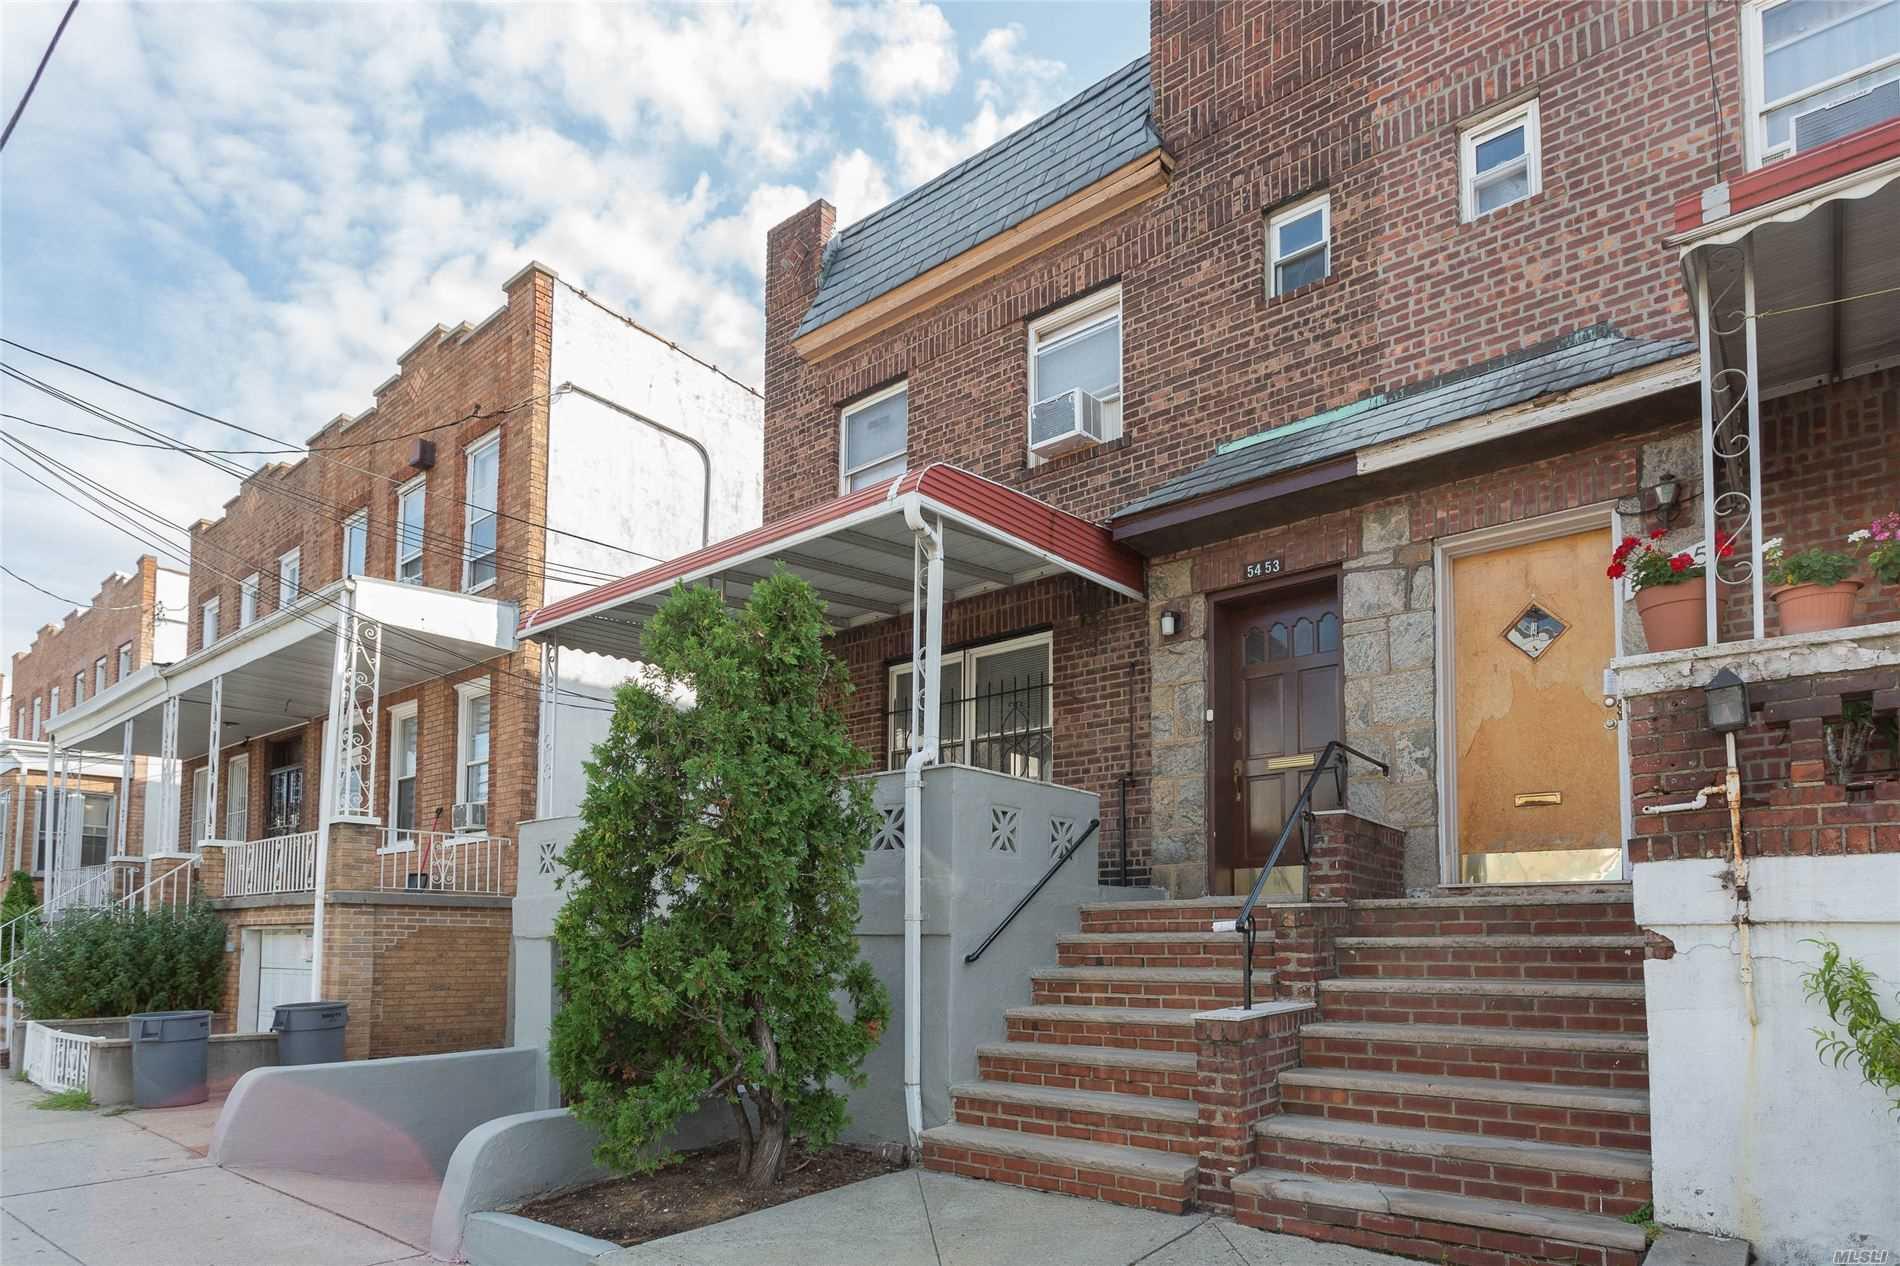 Property for sale at 54-53 69 Lane, Maspeth NY 11378, Maspeth,  New York 11378